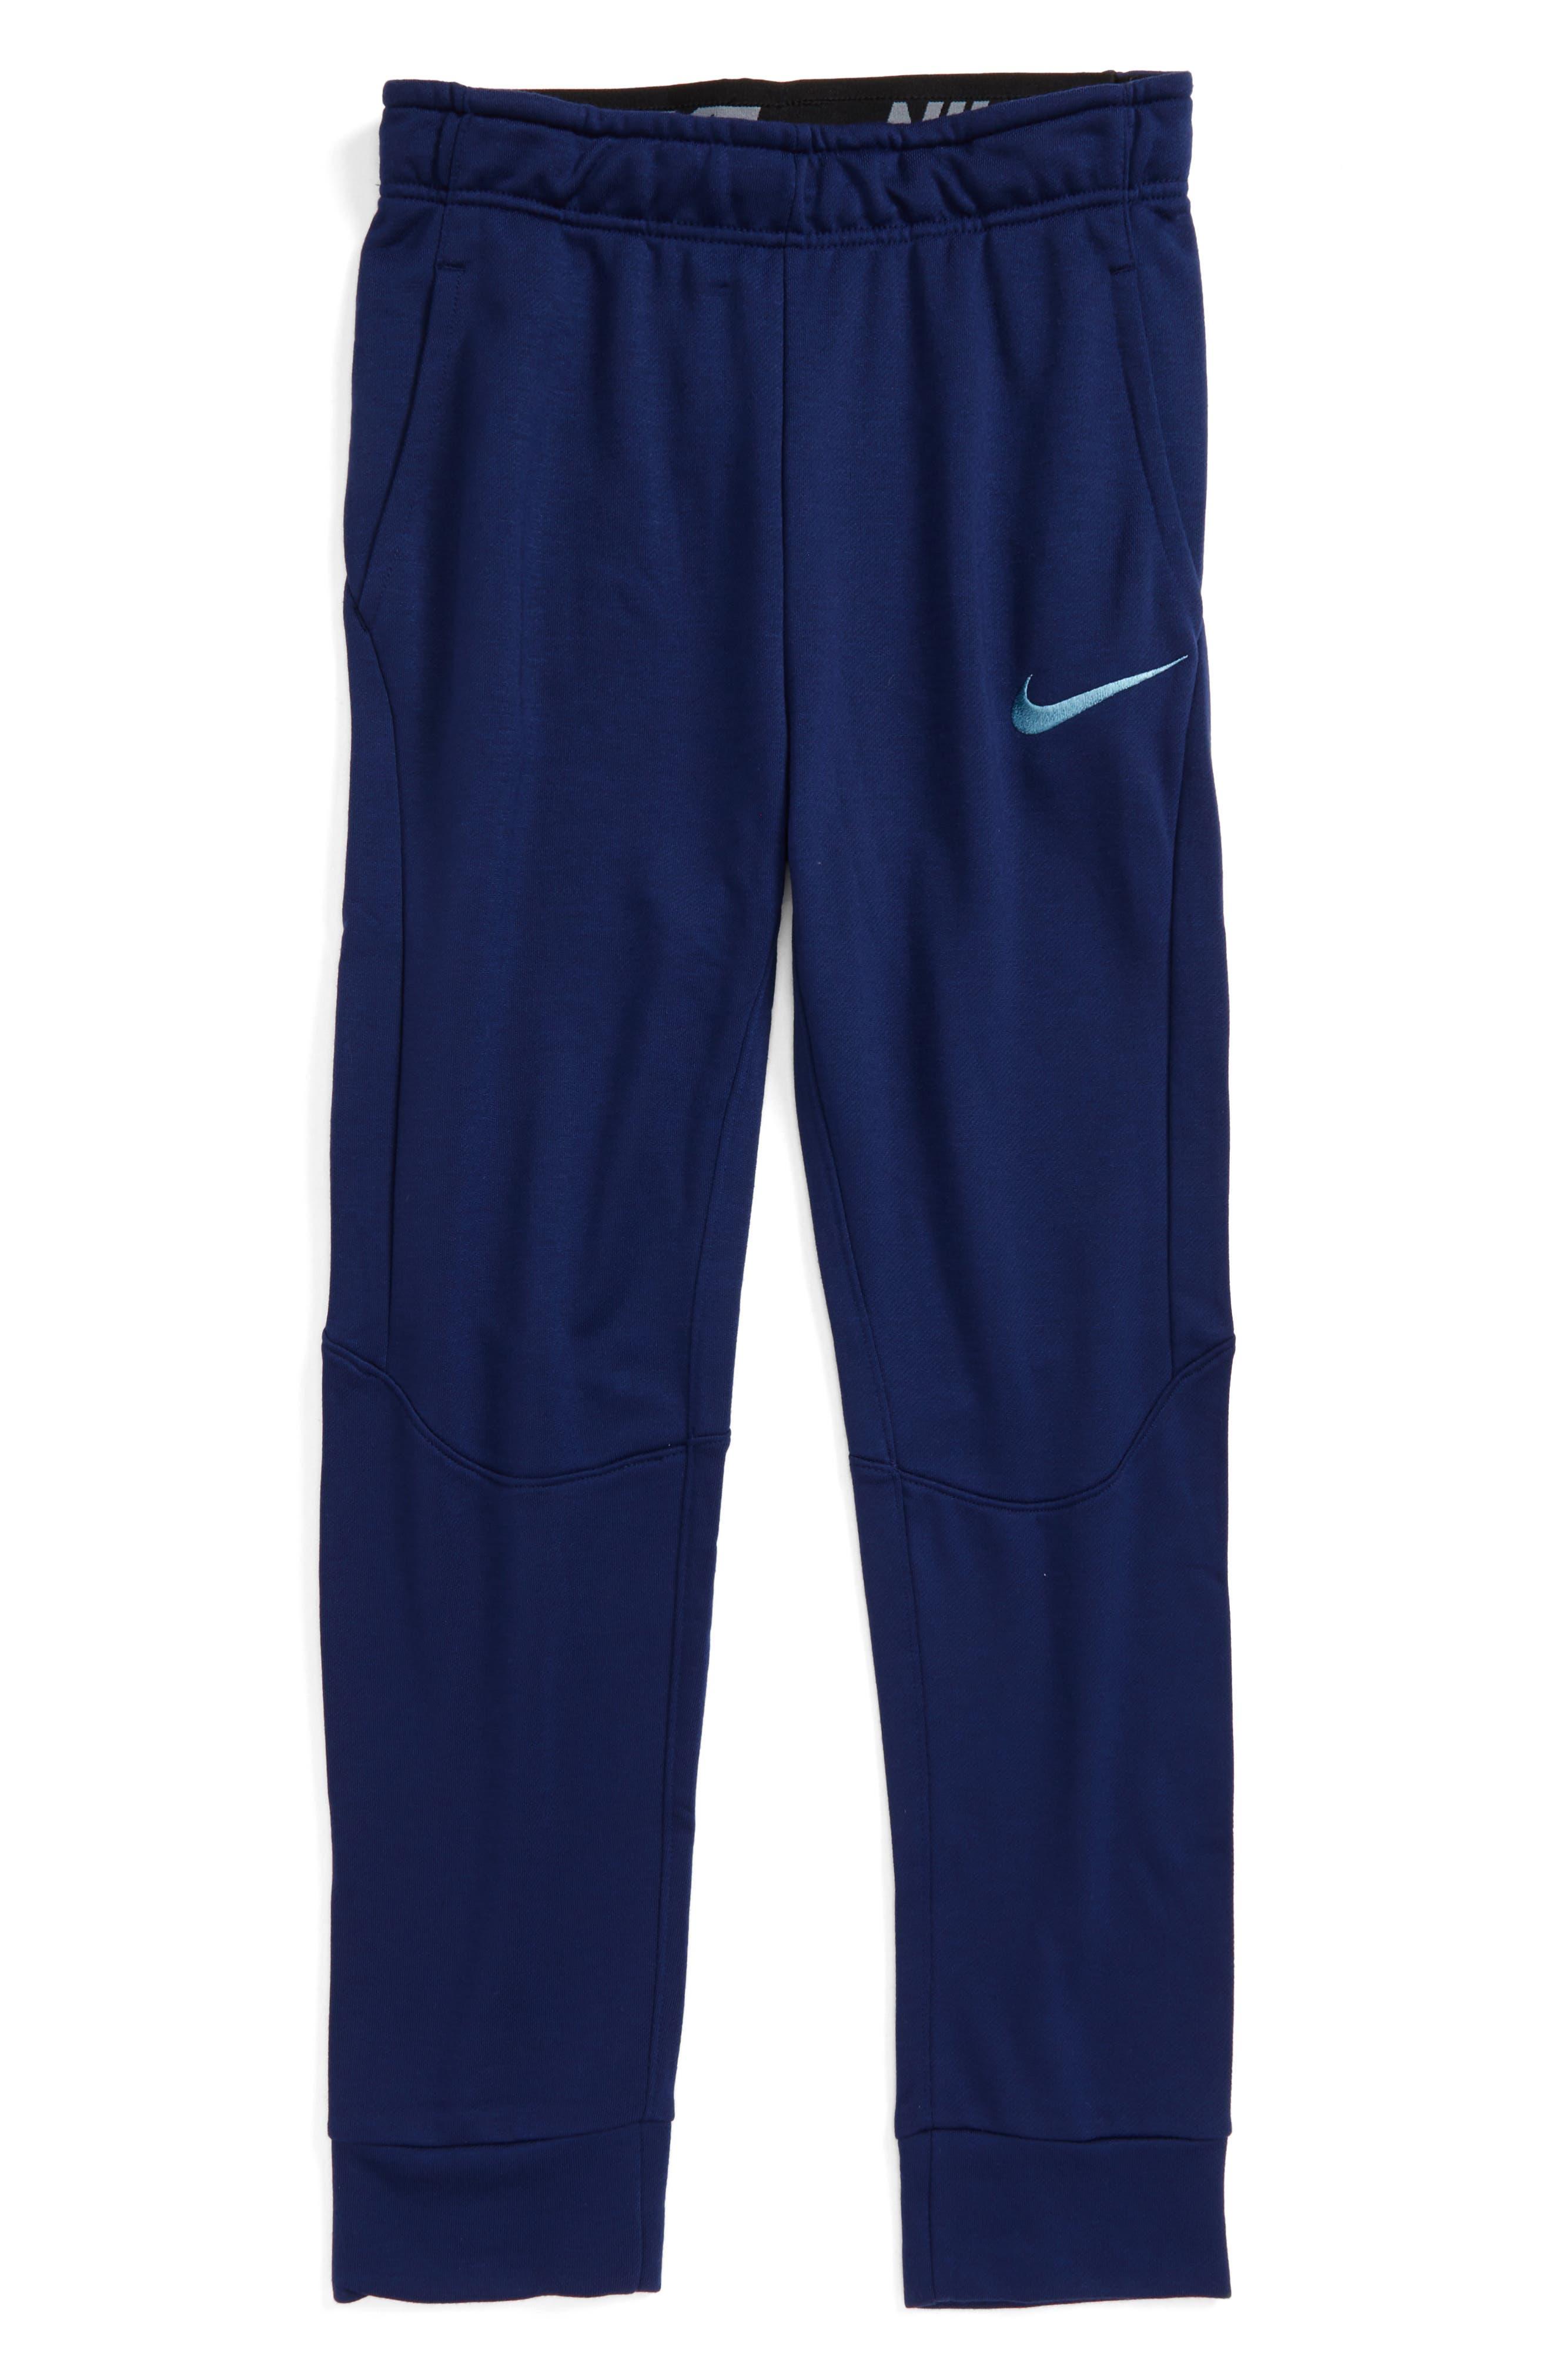 Main Image - Nike Dry Fleece Training Pants (Little Boys & Big Boys)